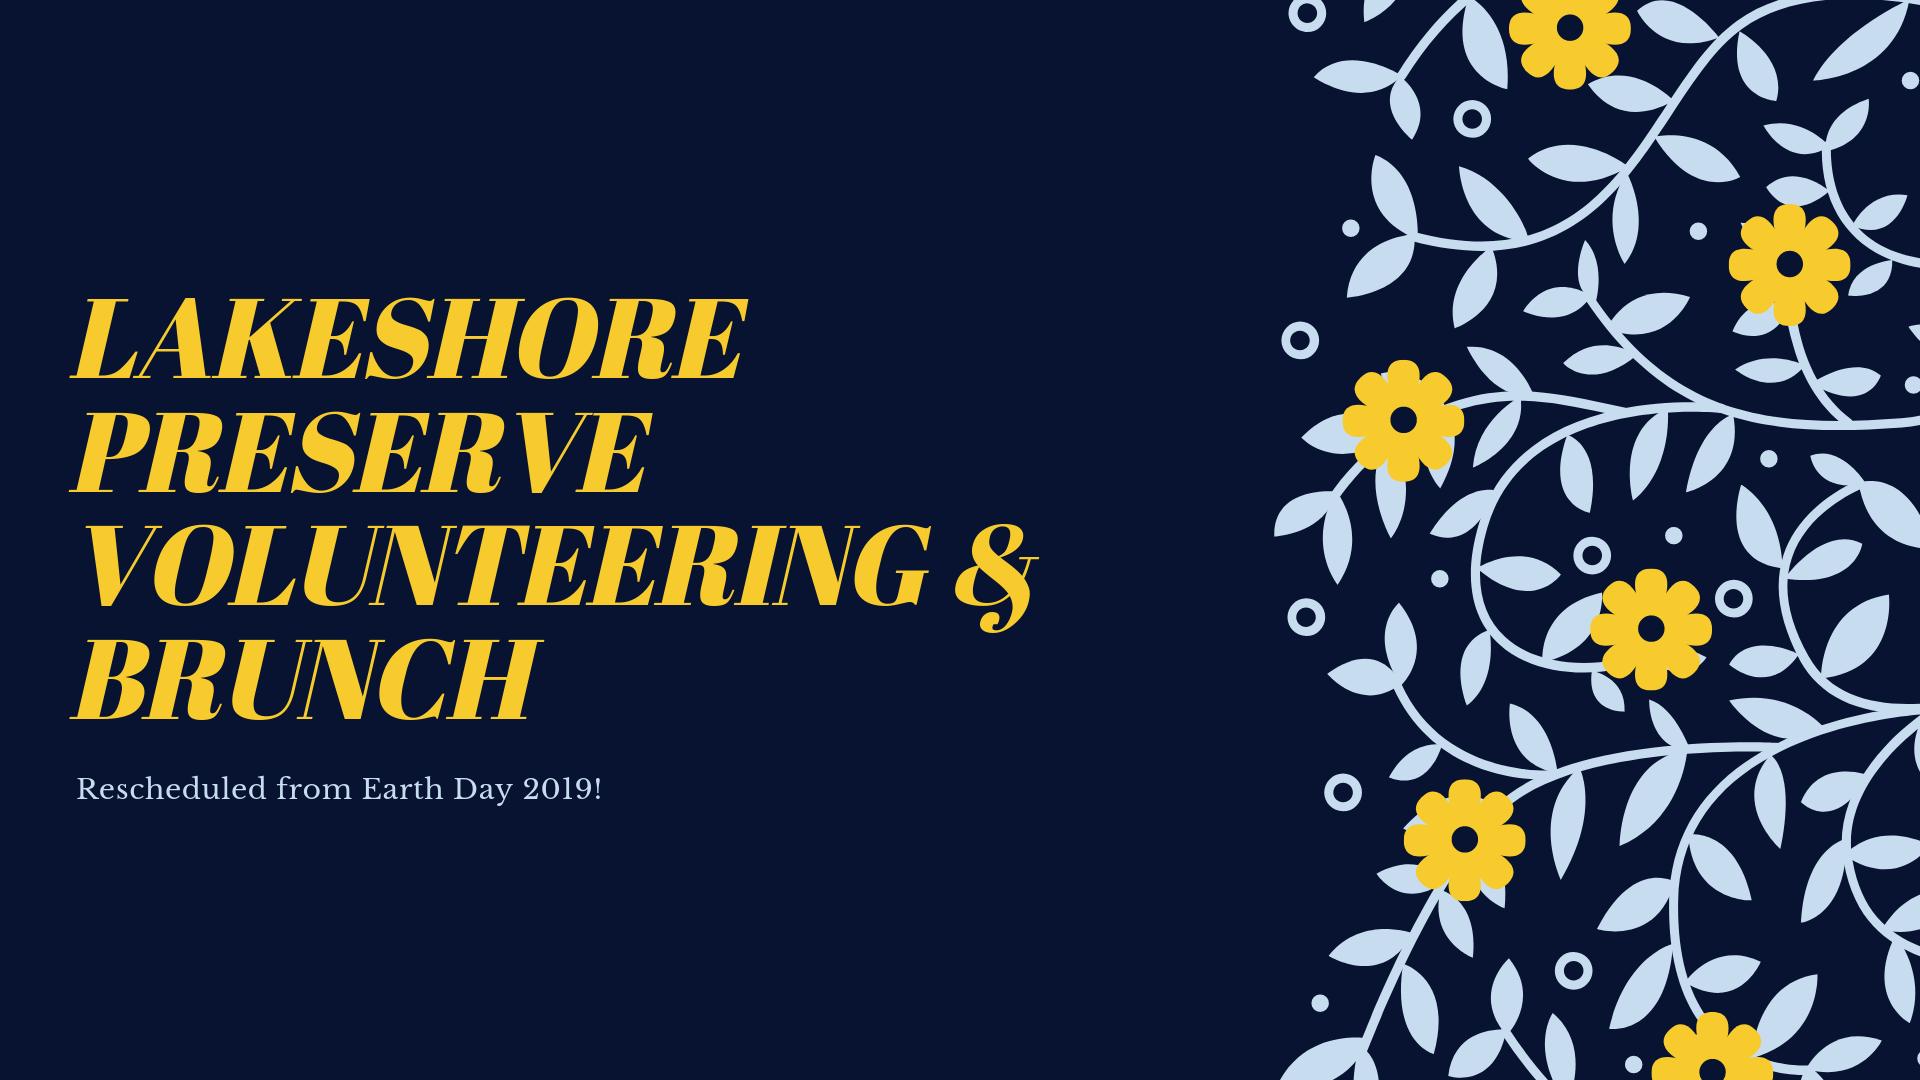 Lakeshore Preserve Volunteering & Brunch (1).png